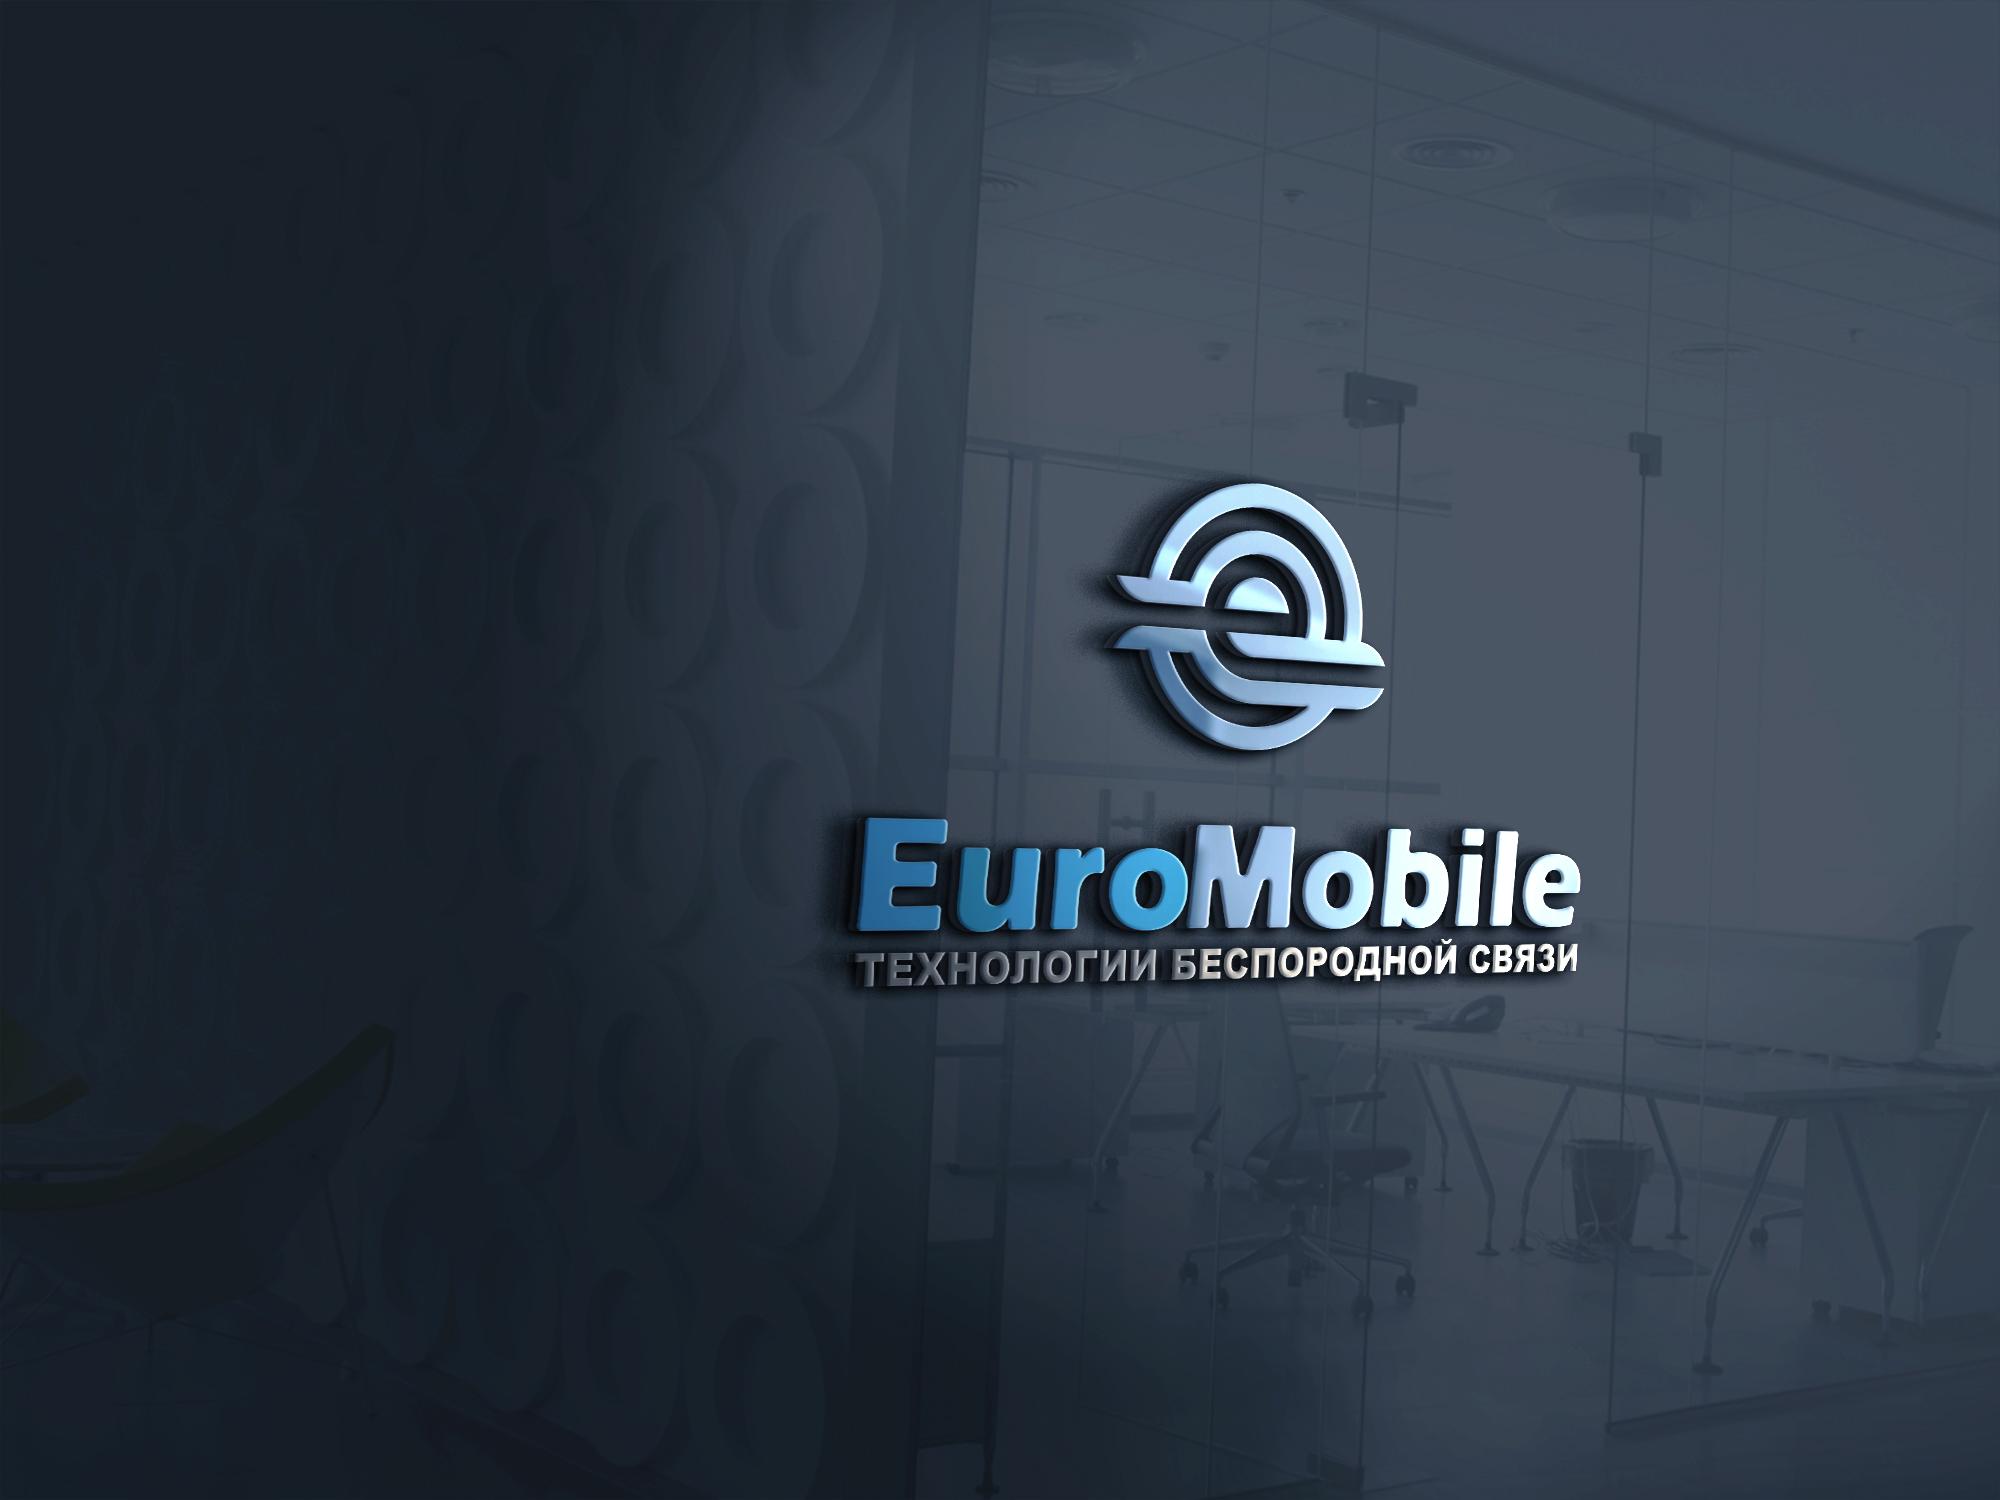 Редизайн логотипа фото f_05559c5201d8d4b2.jpg